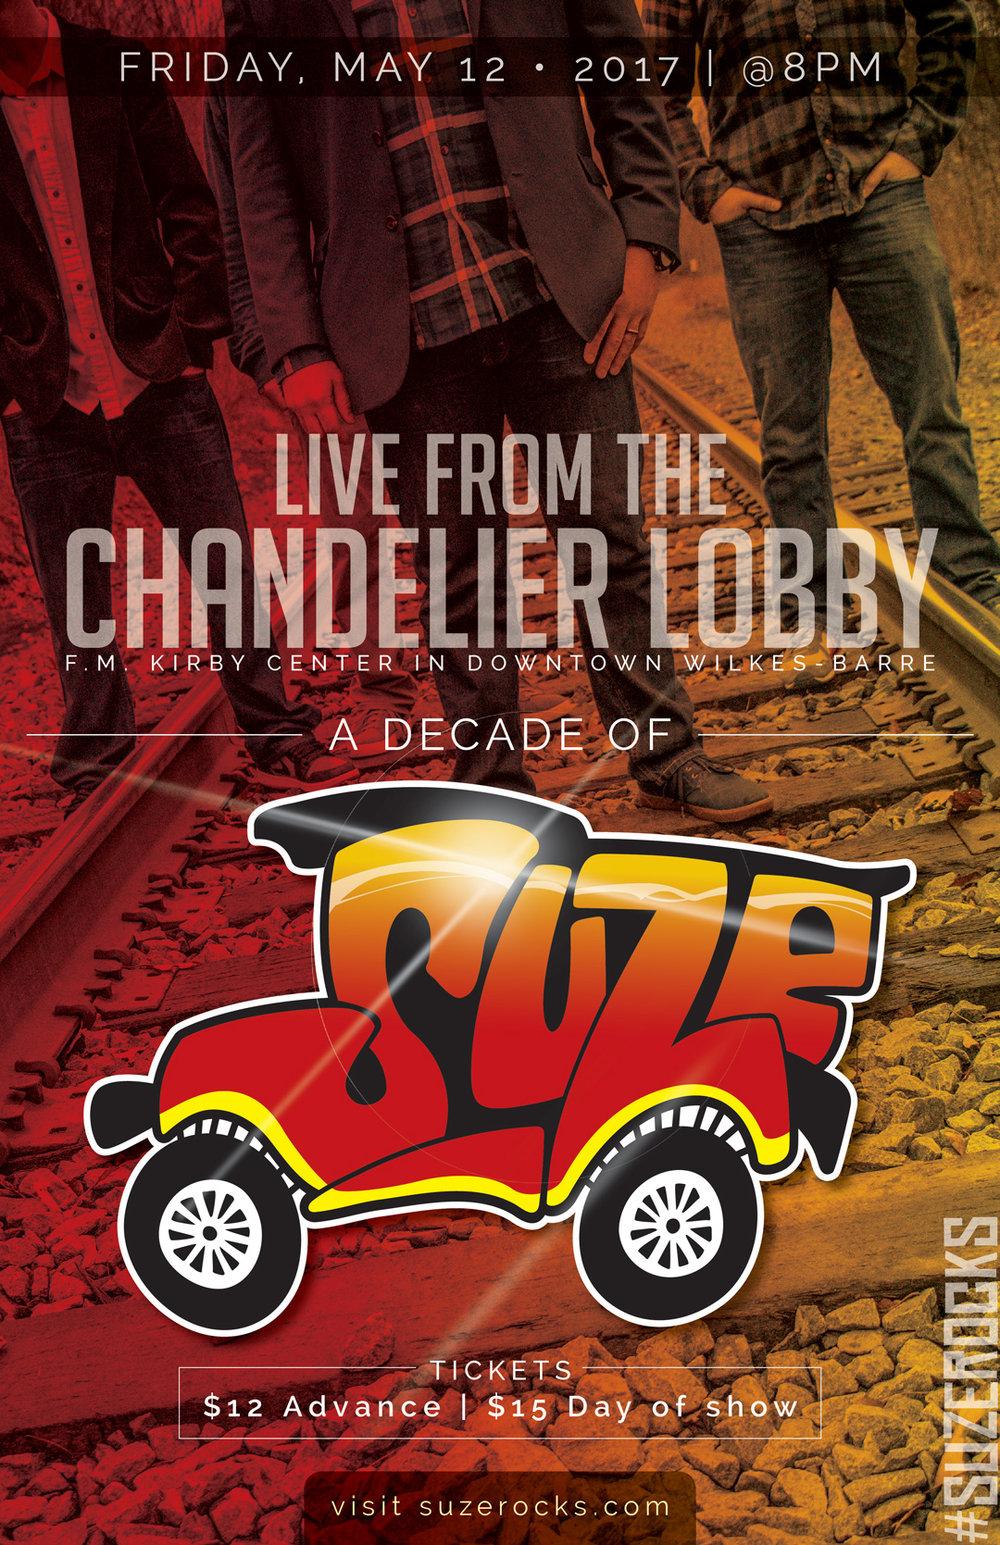 SUZE---11x17-Ad2.jpg